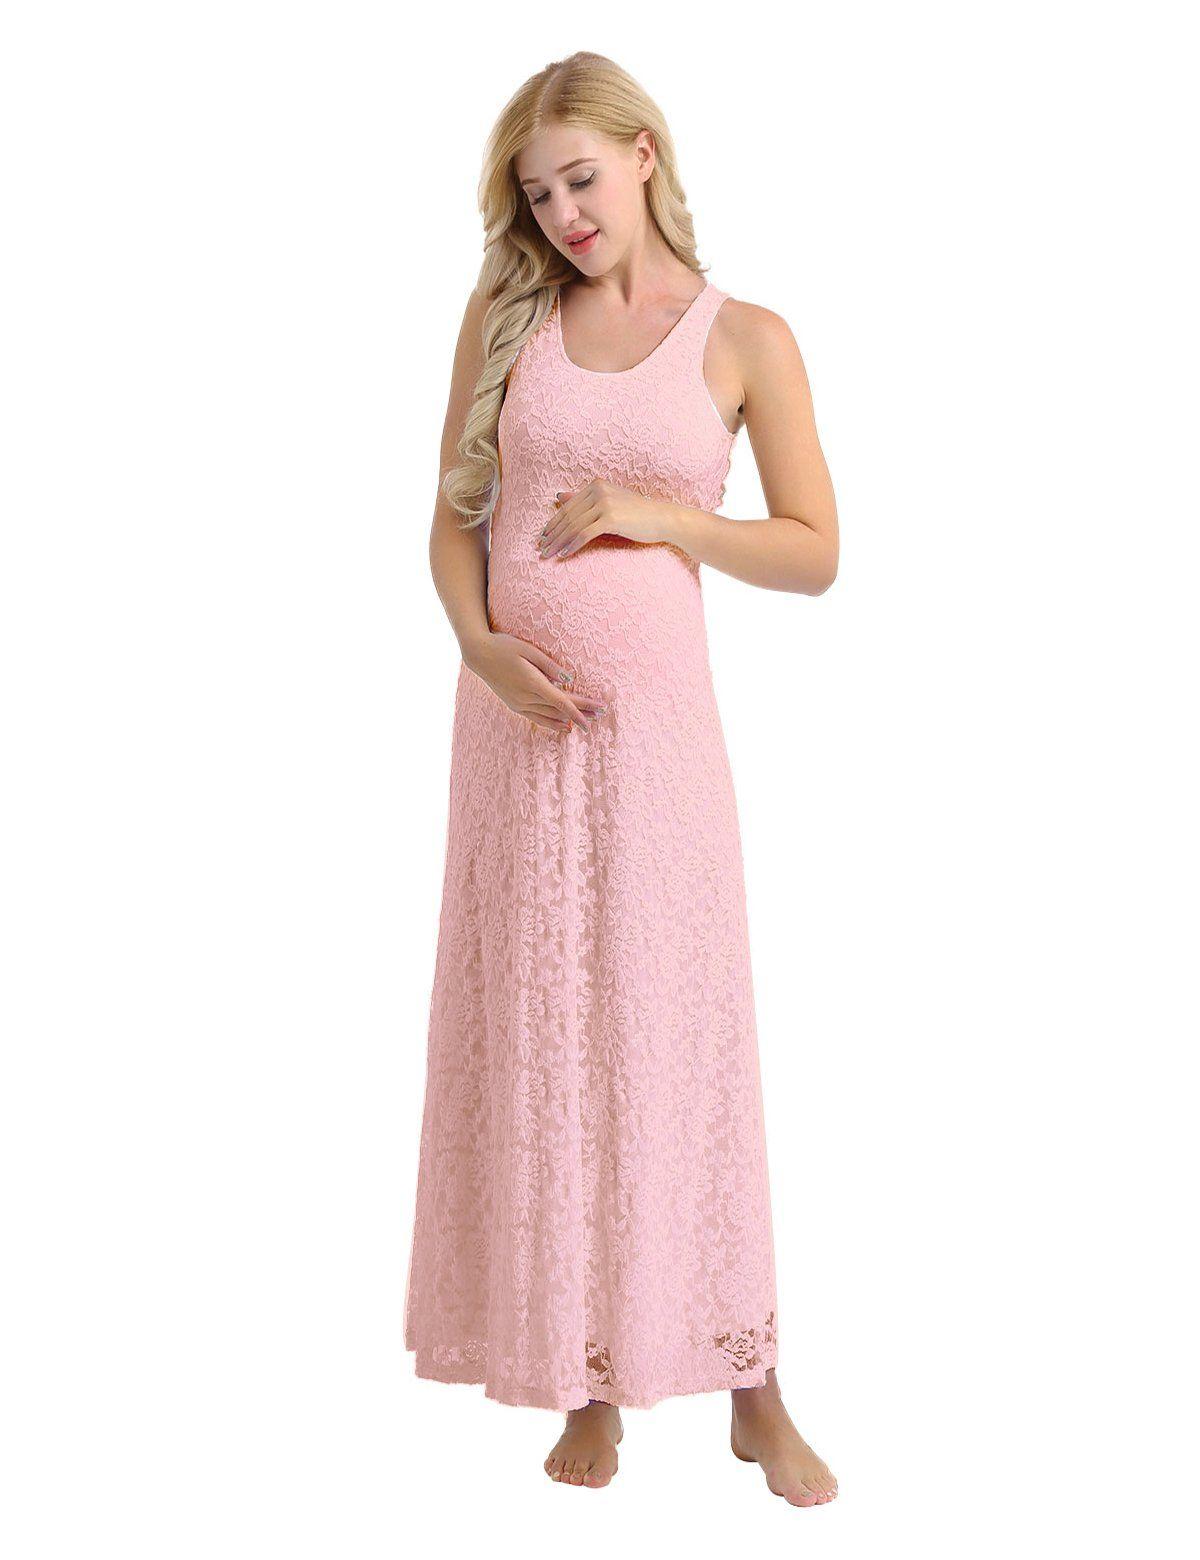 30316597838d7 Maternity Outfits - designer maternity maxi dress : YiZYiF Womens Maternity  Maxi Tank Dress Sleeveless Full Length Lace Dress Pink Large *** Discover  more ...